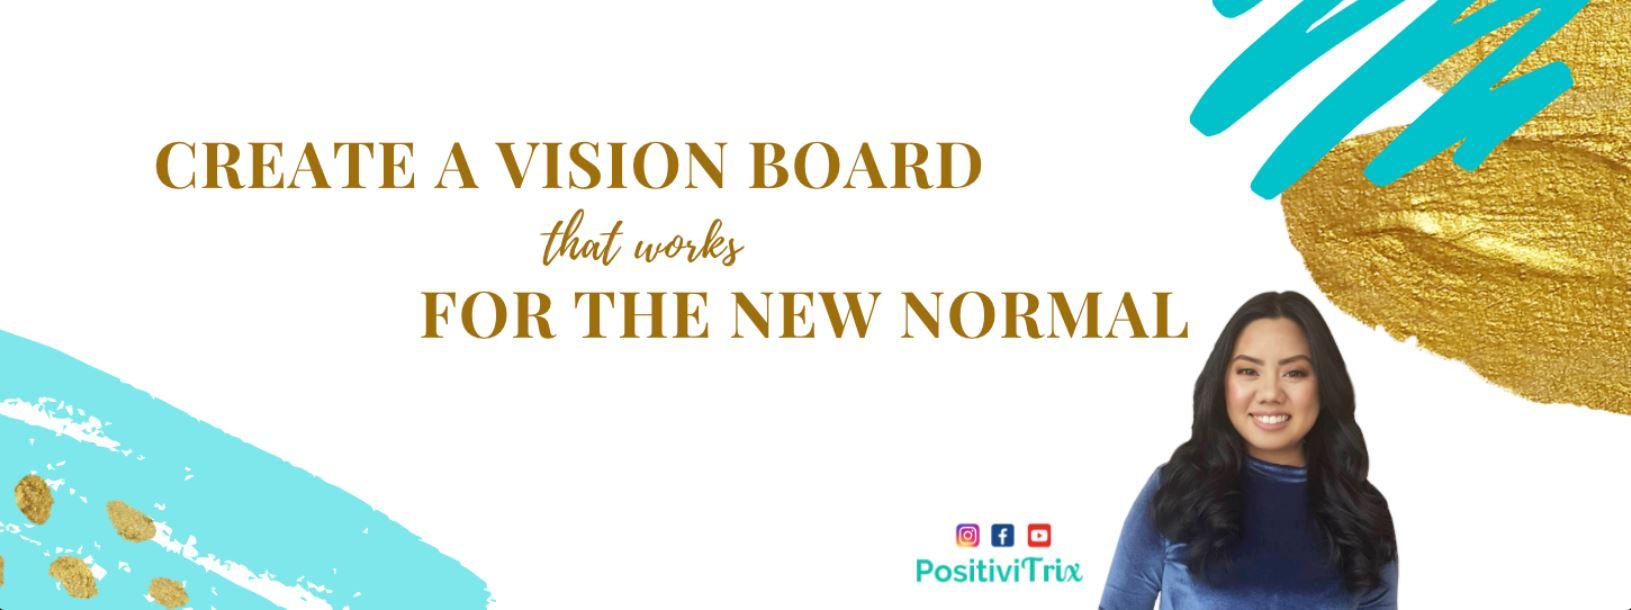 Vision Board Trixie Esguerra